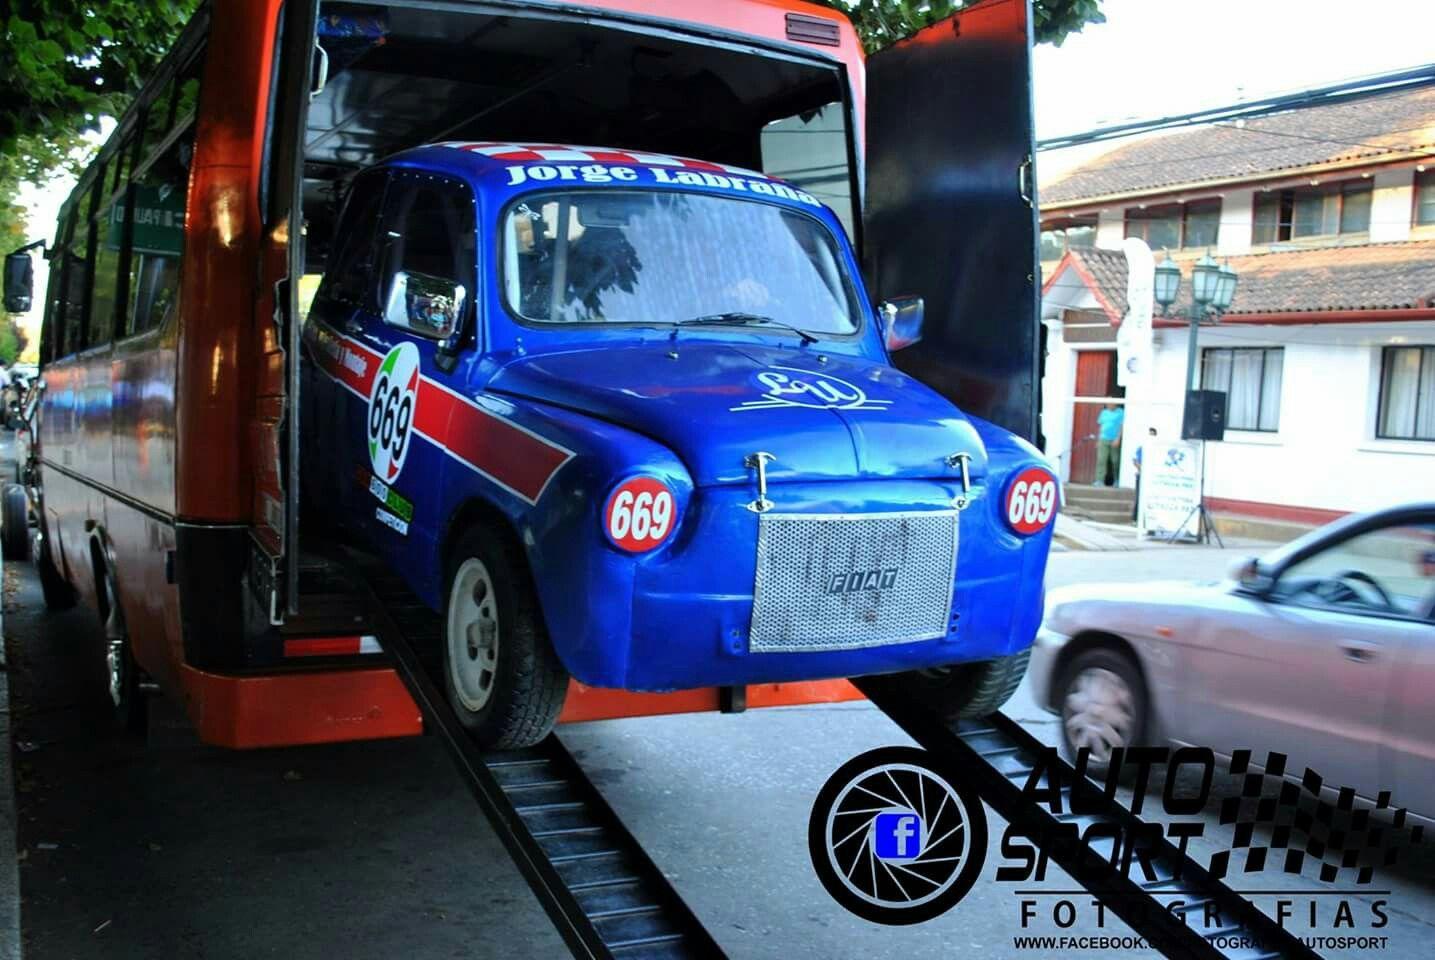 Modificación fiat 600 para carreras std, raicing competición, competition, sport cars, coches , fito, fitito